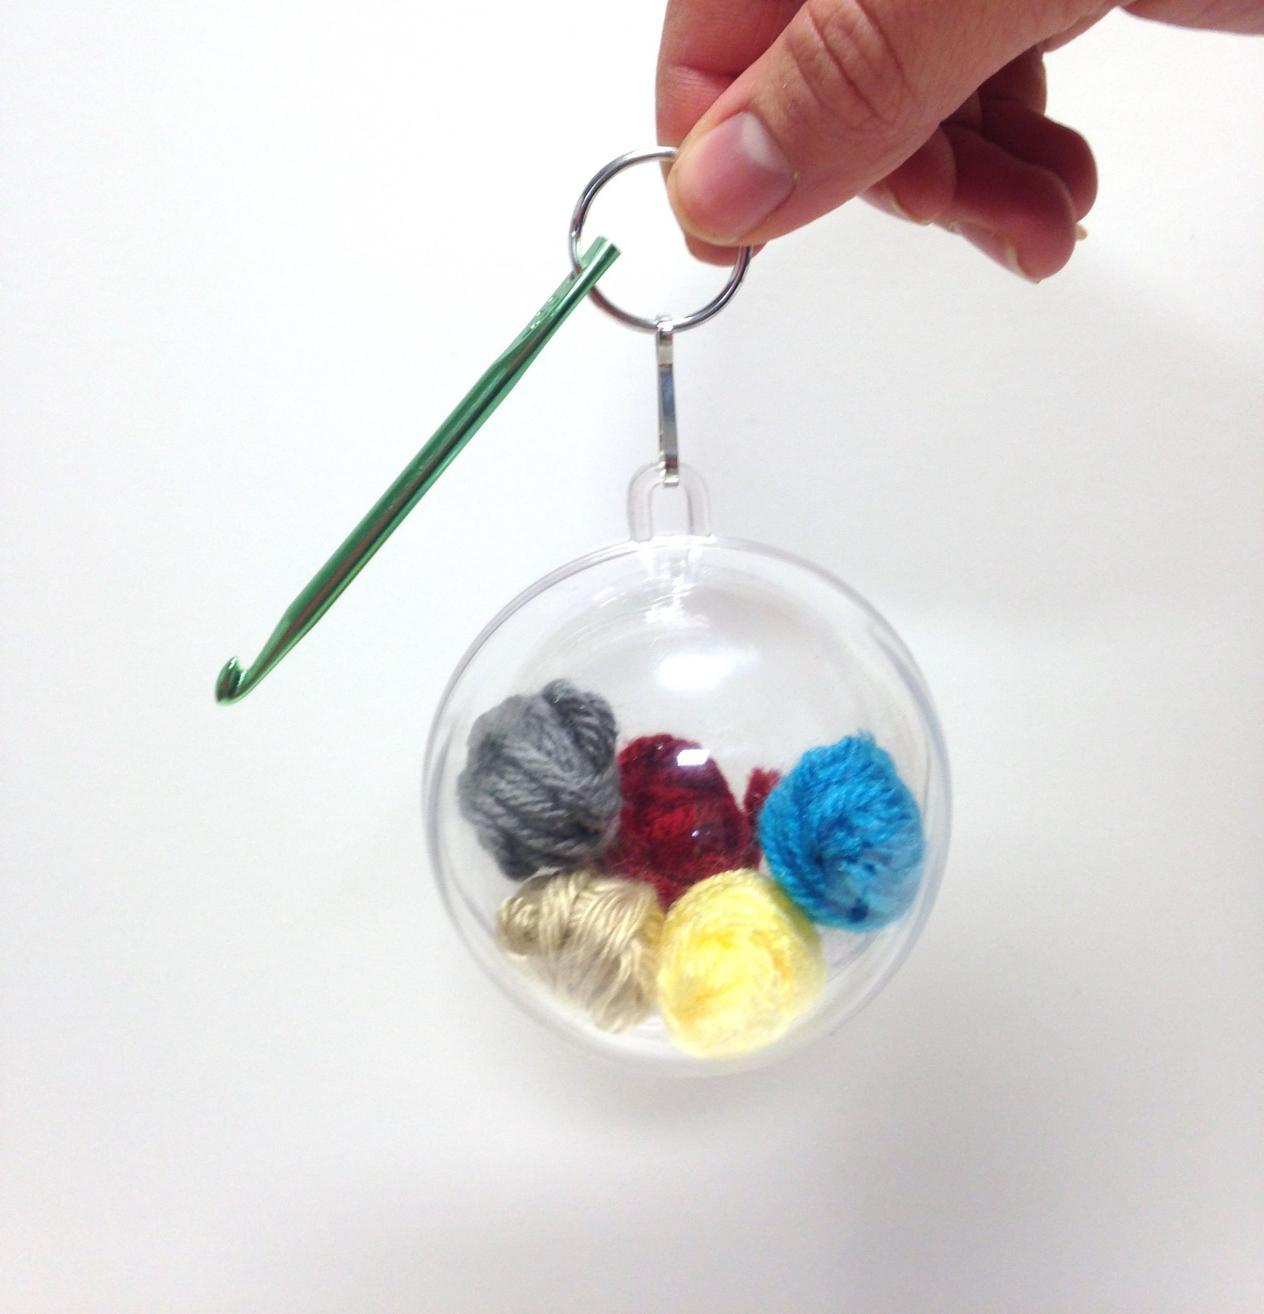 Our New Crochet Hook Key Chain Ornament Kits-roundornamentfinished-jpg